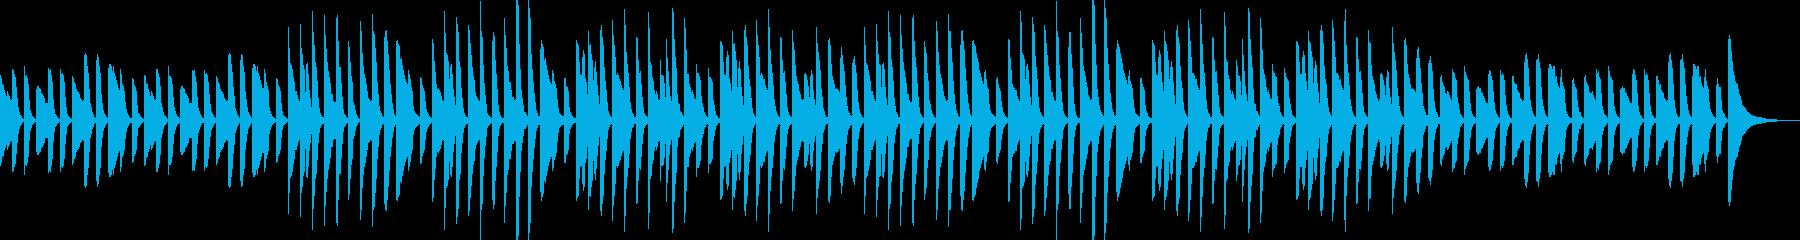 YouTube・日常・会話・ピアノソロの再生済みの波形